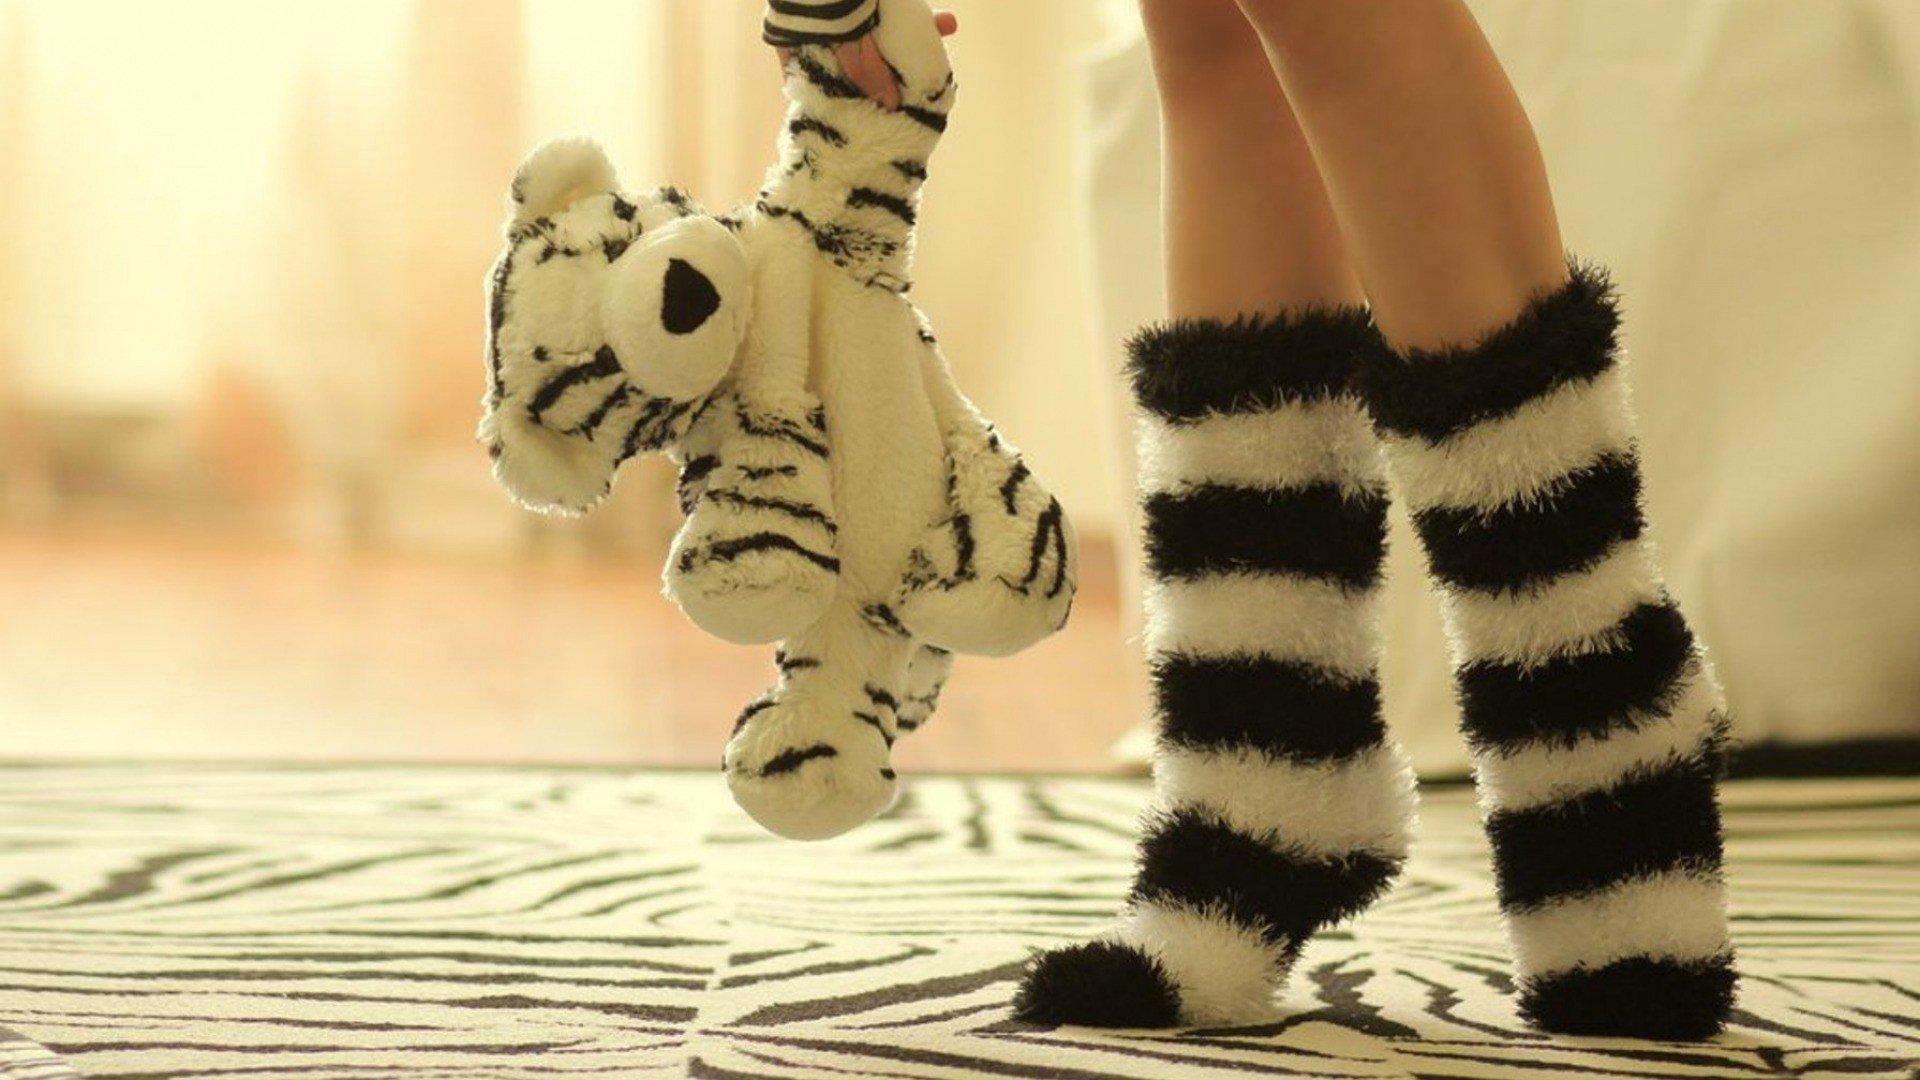 Legs socks plush animal striped legwear wallpaper 1920x1080 legs socks plush animal striped legwear wallpaper 1920x1080 346024 wallpaperup voltagebd Gallery